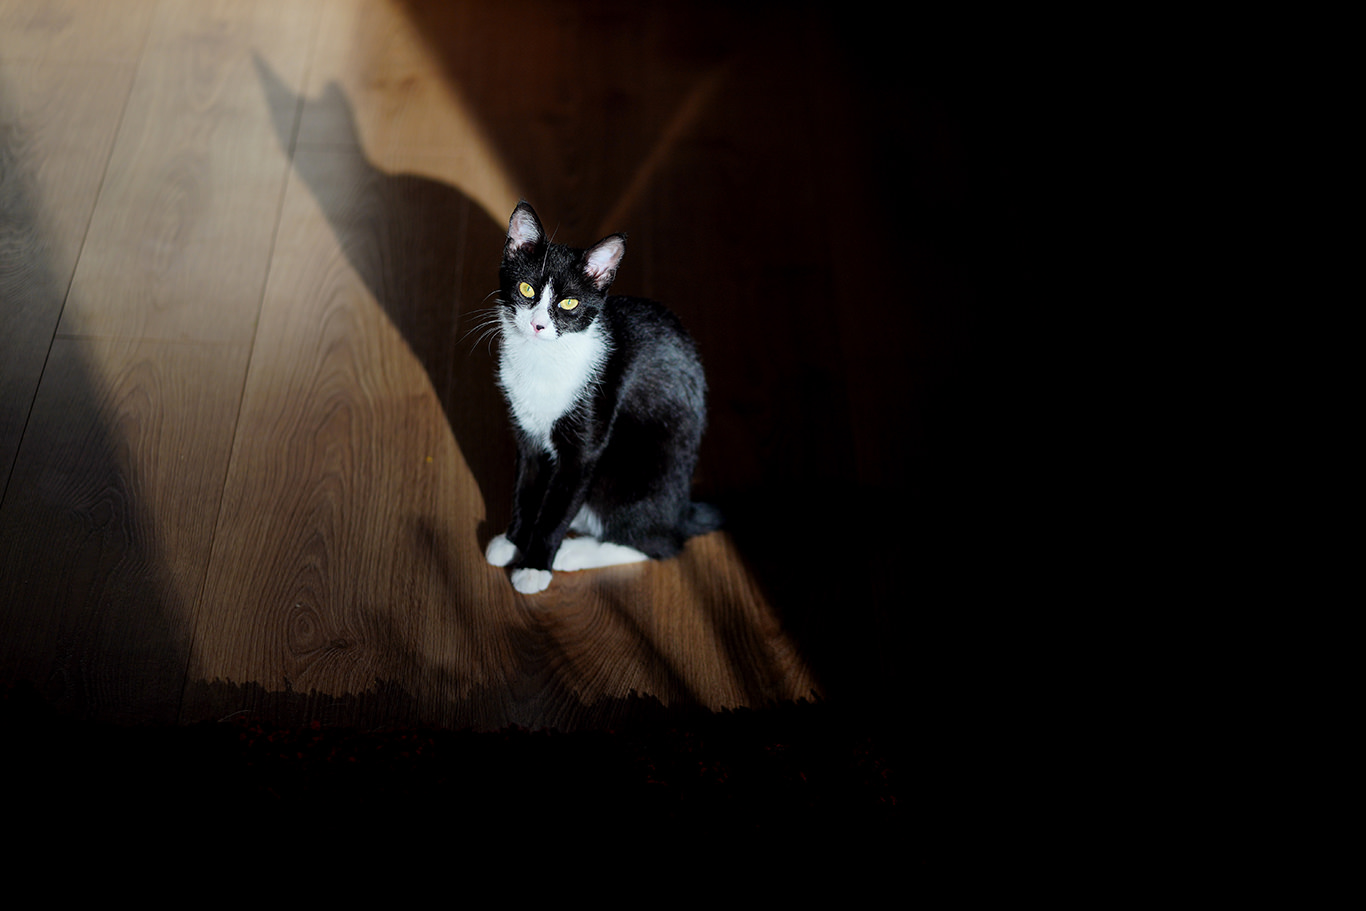 Pisica in soare